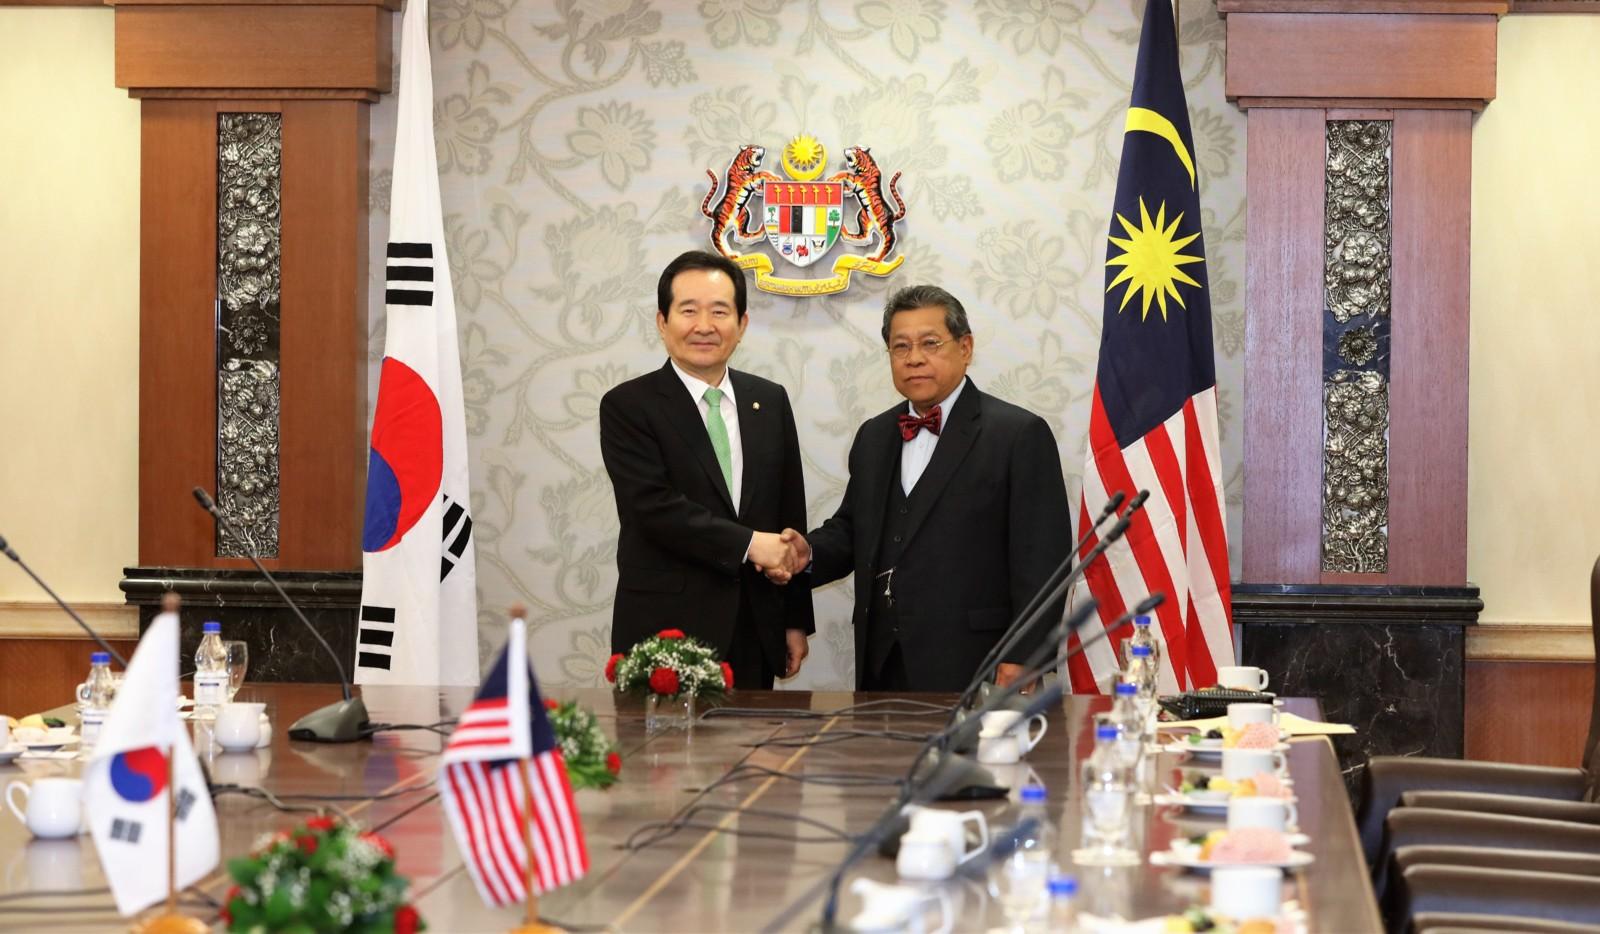 kunjungan-hormat-oleh-speaker-of-the-republic-of-korea-ke-atas-yang-di-pertua-dewan-rakyat